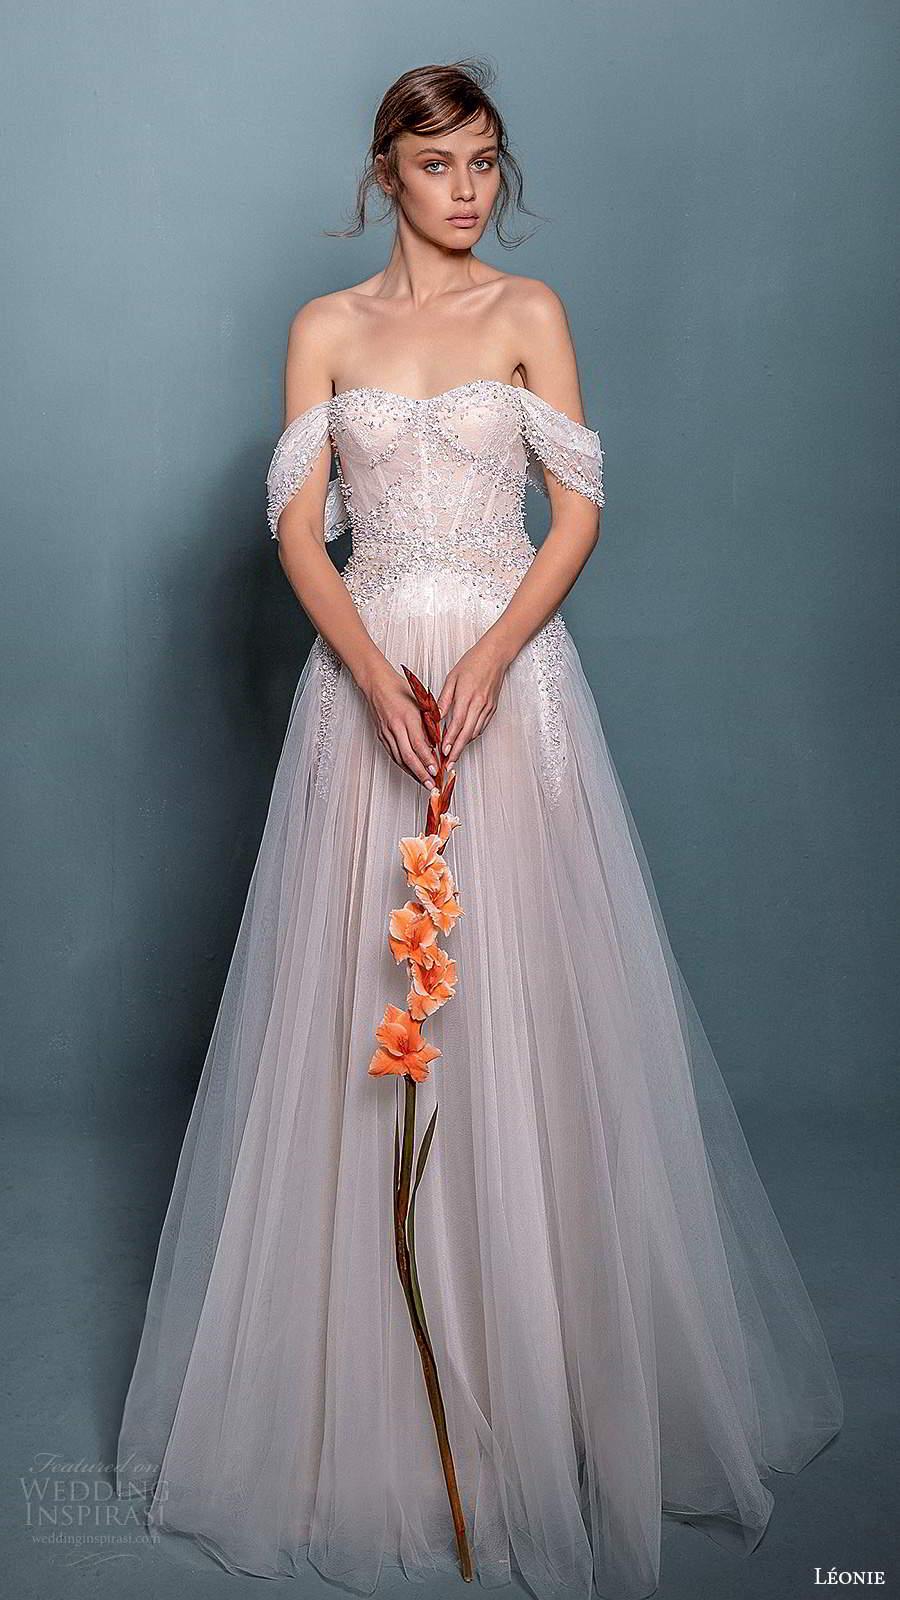 leonie bridal 2020 bridal off shoulder straps semi sweetheart neckline fully embellished a line ball gown wedding dress (12) mv